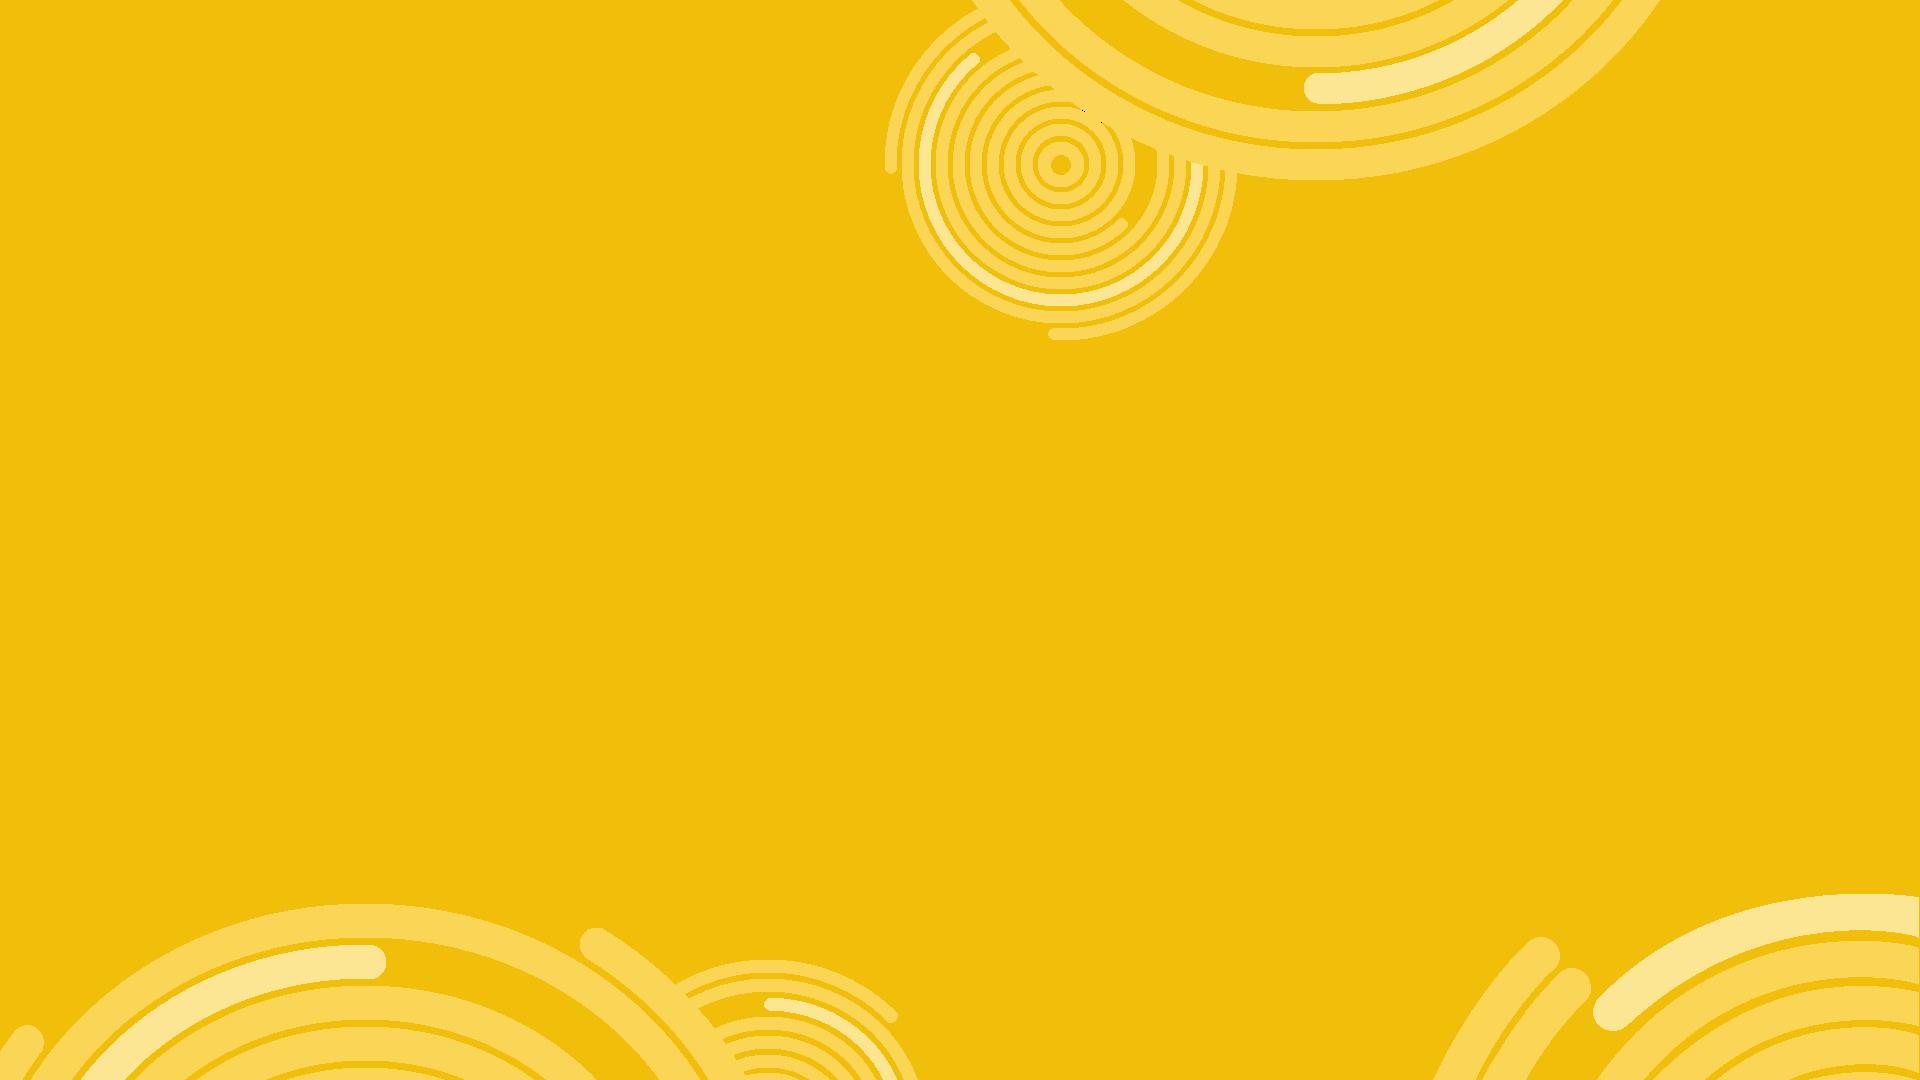 Yellow Nature Background Hd